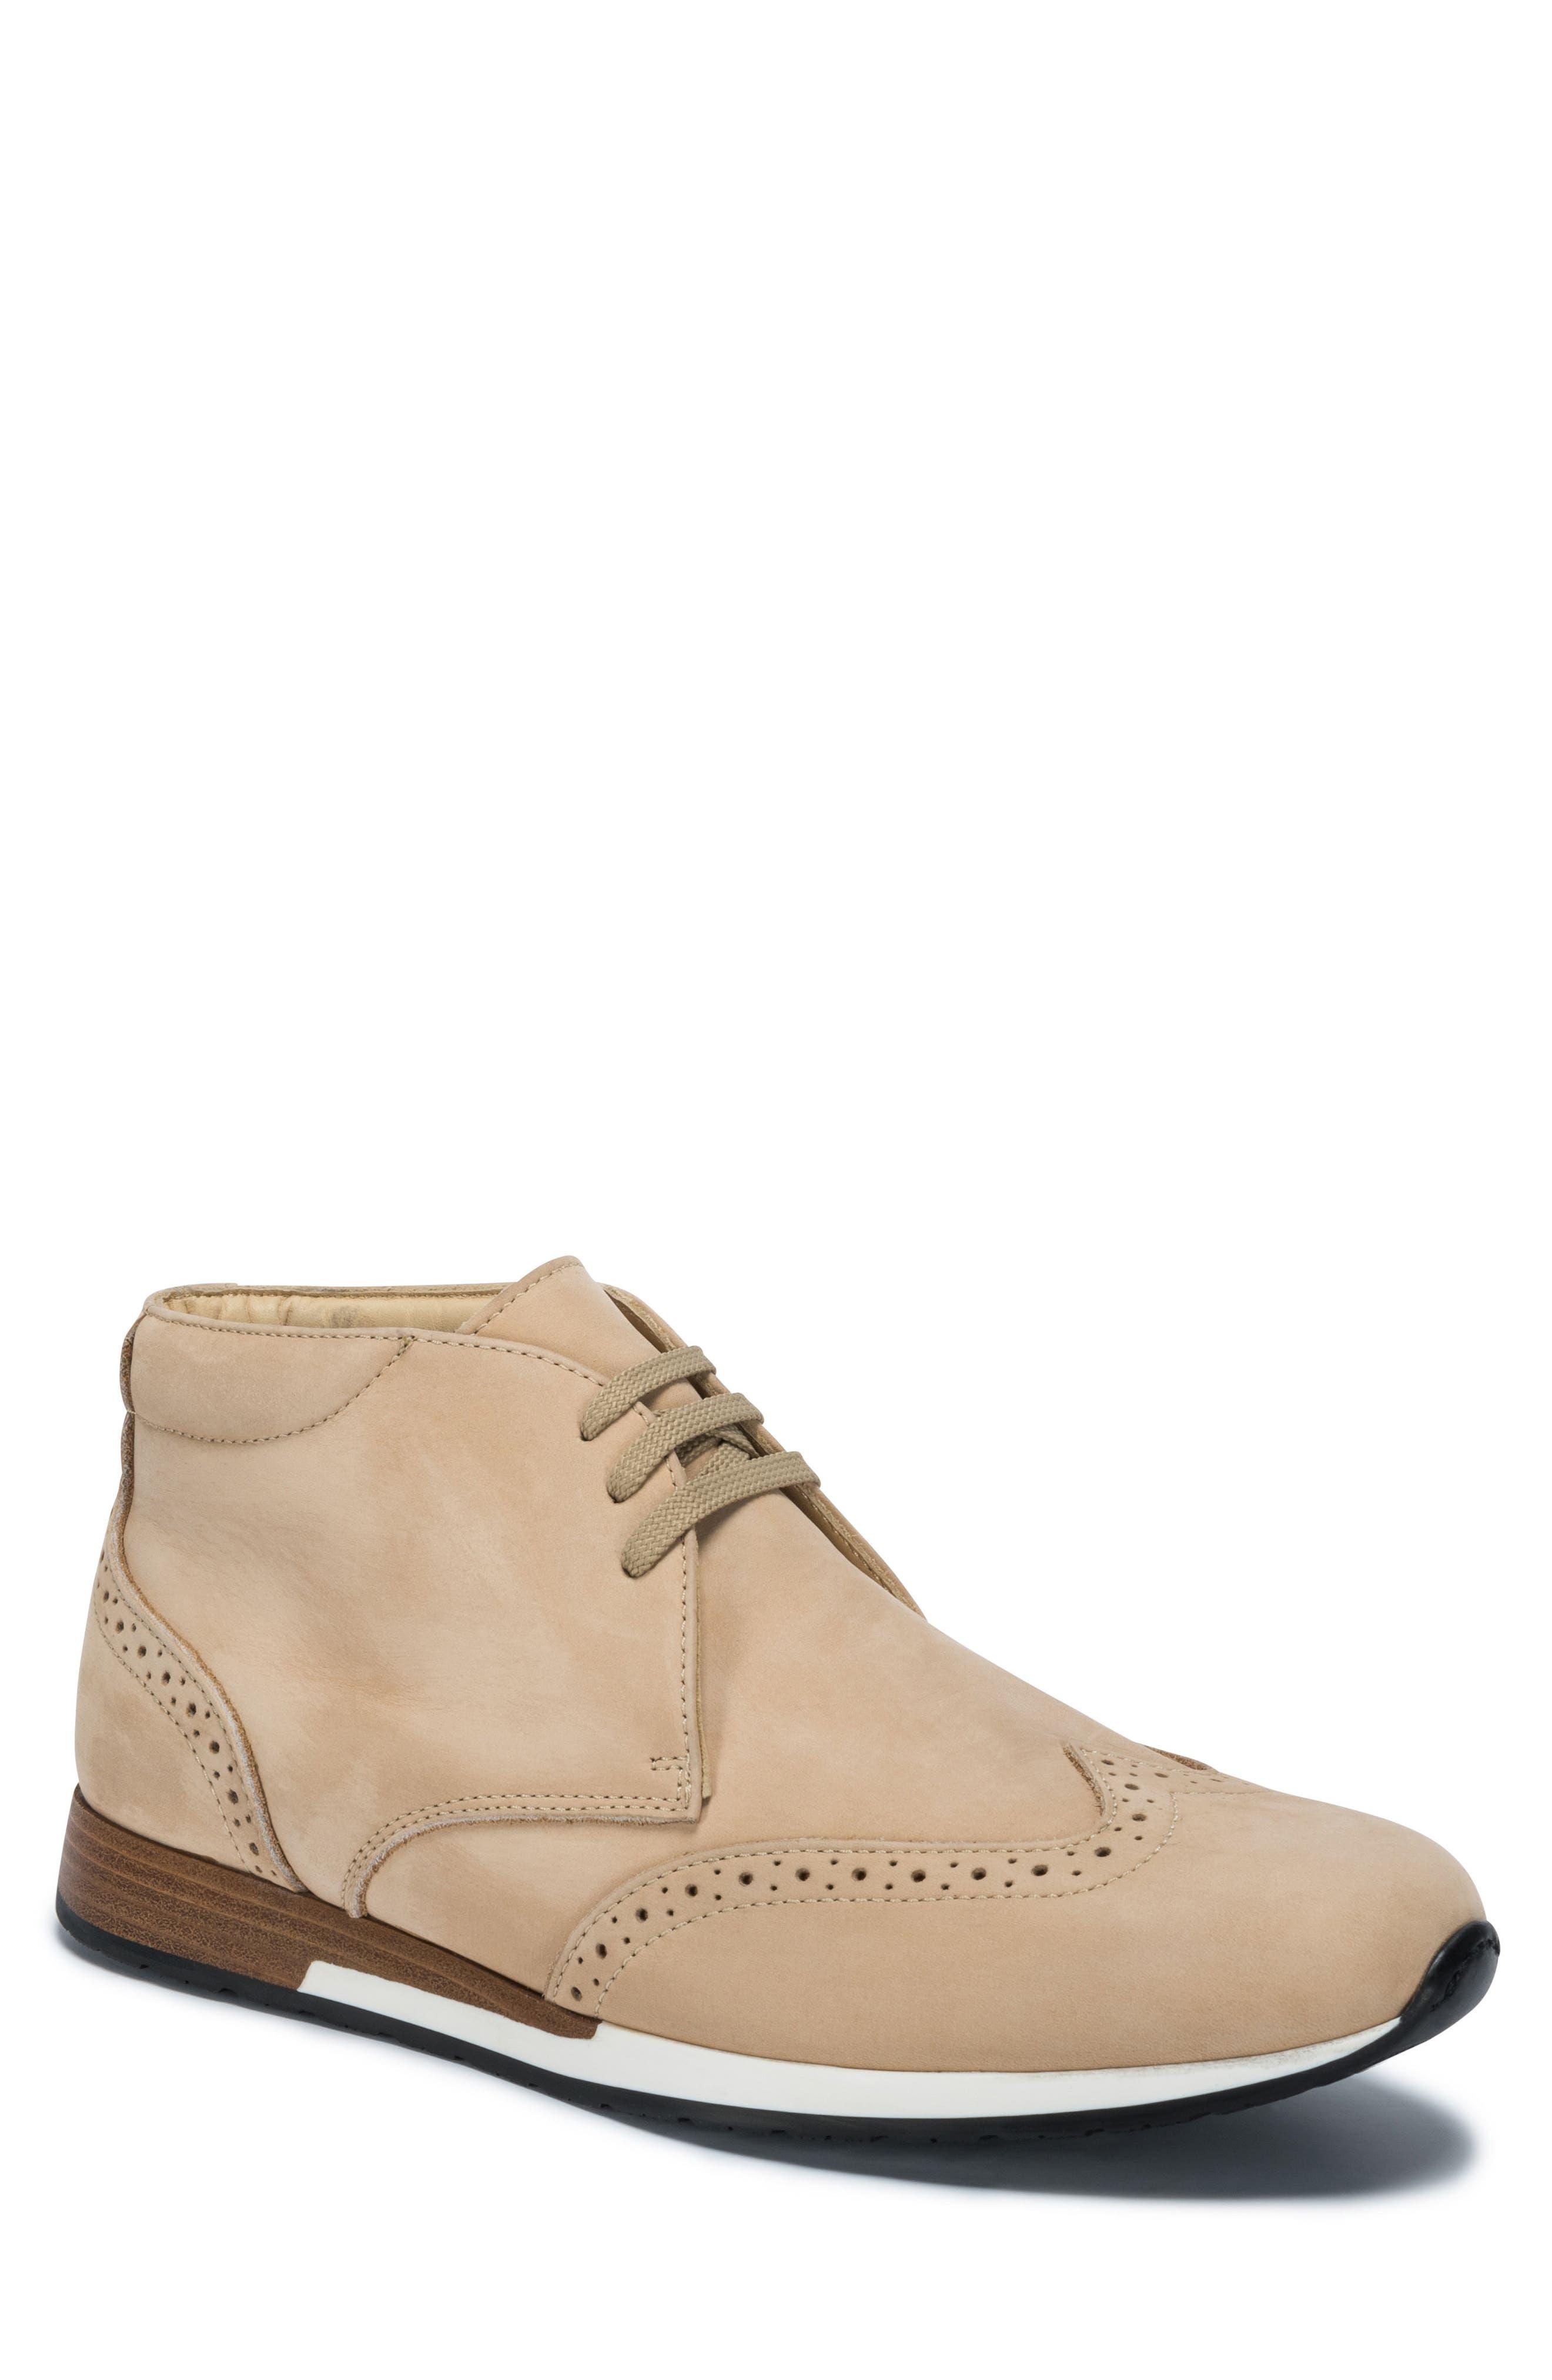 Pistoia Chukka Sneaker,                         Main,                         color, 278